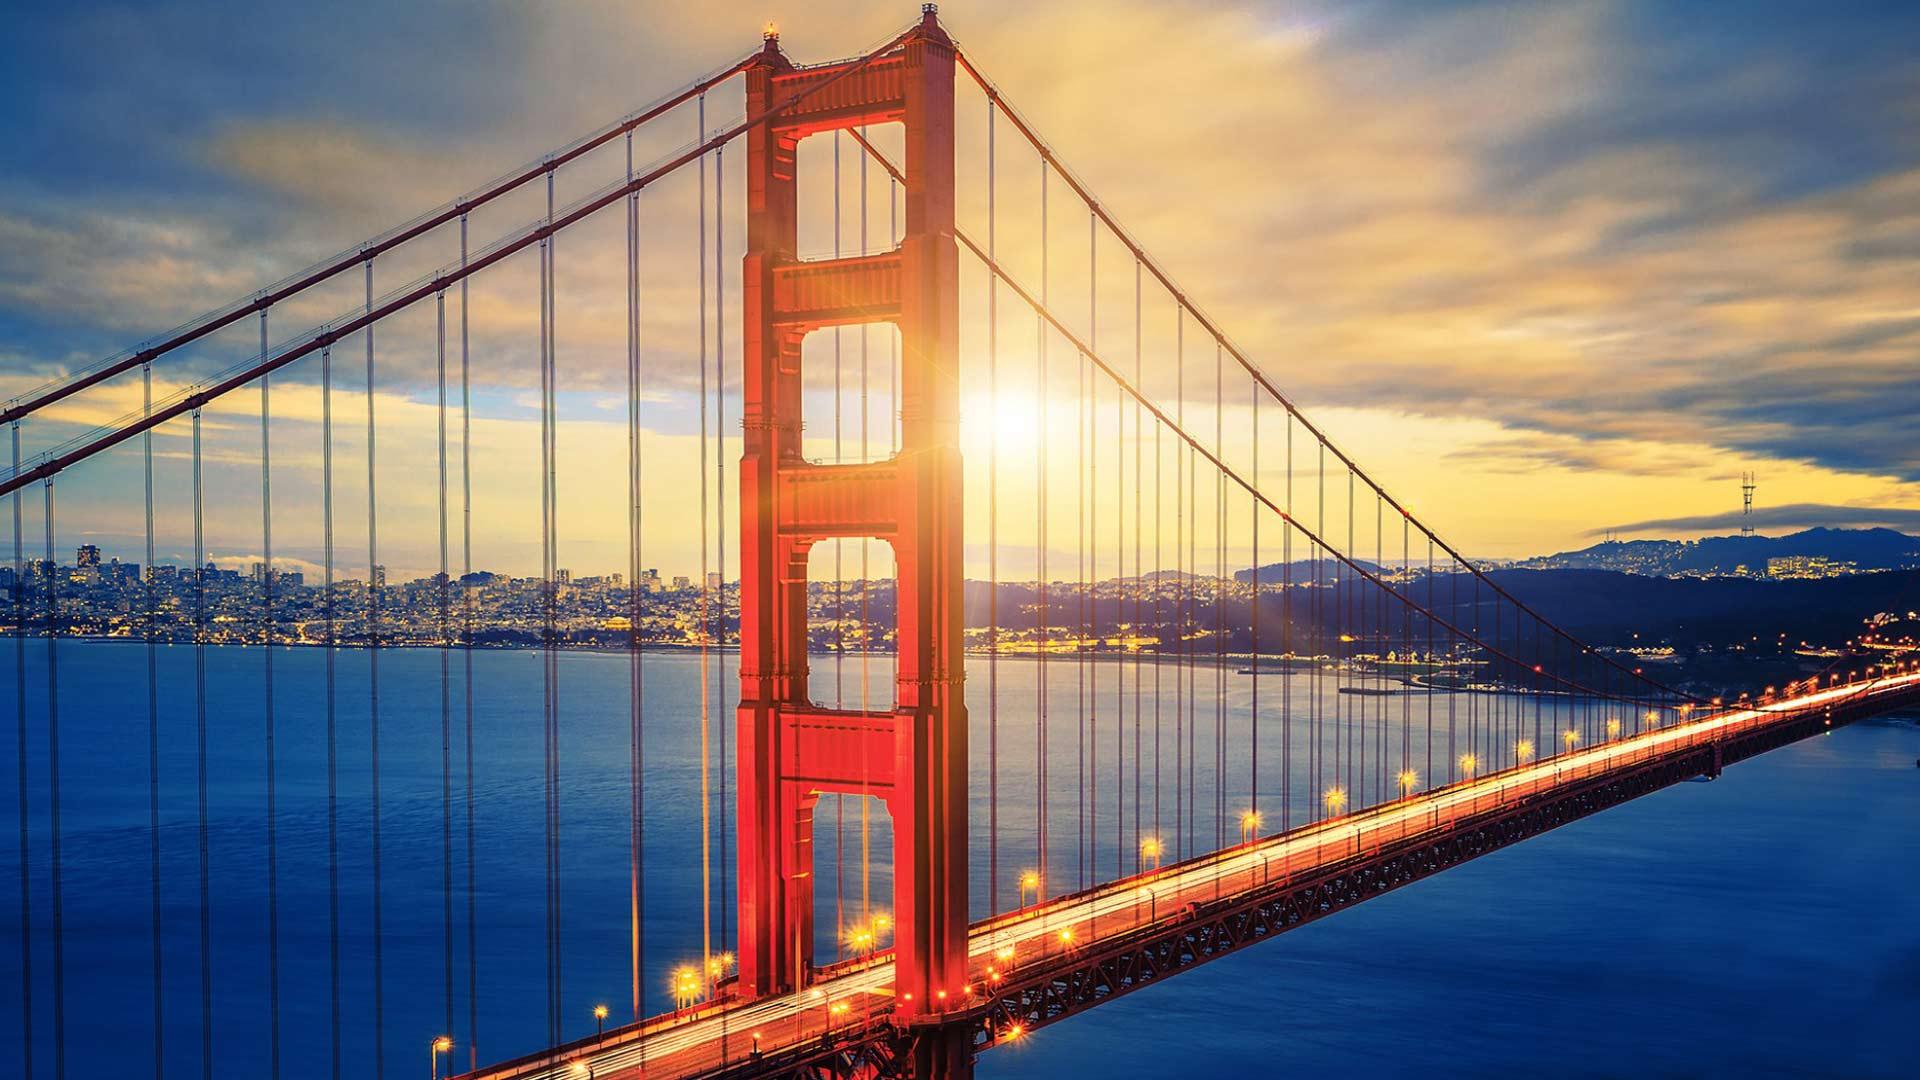 Golden Gate Bridge Sunset Hd